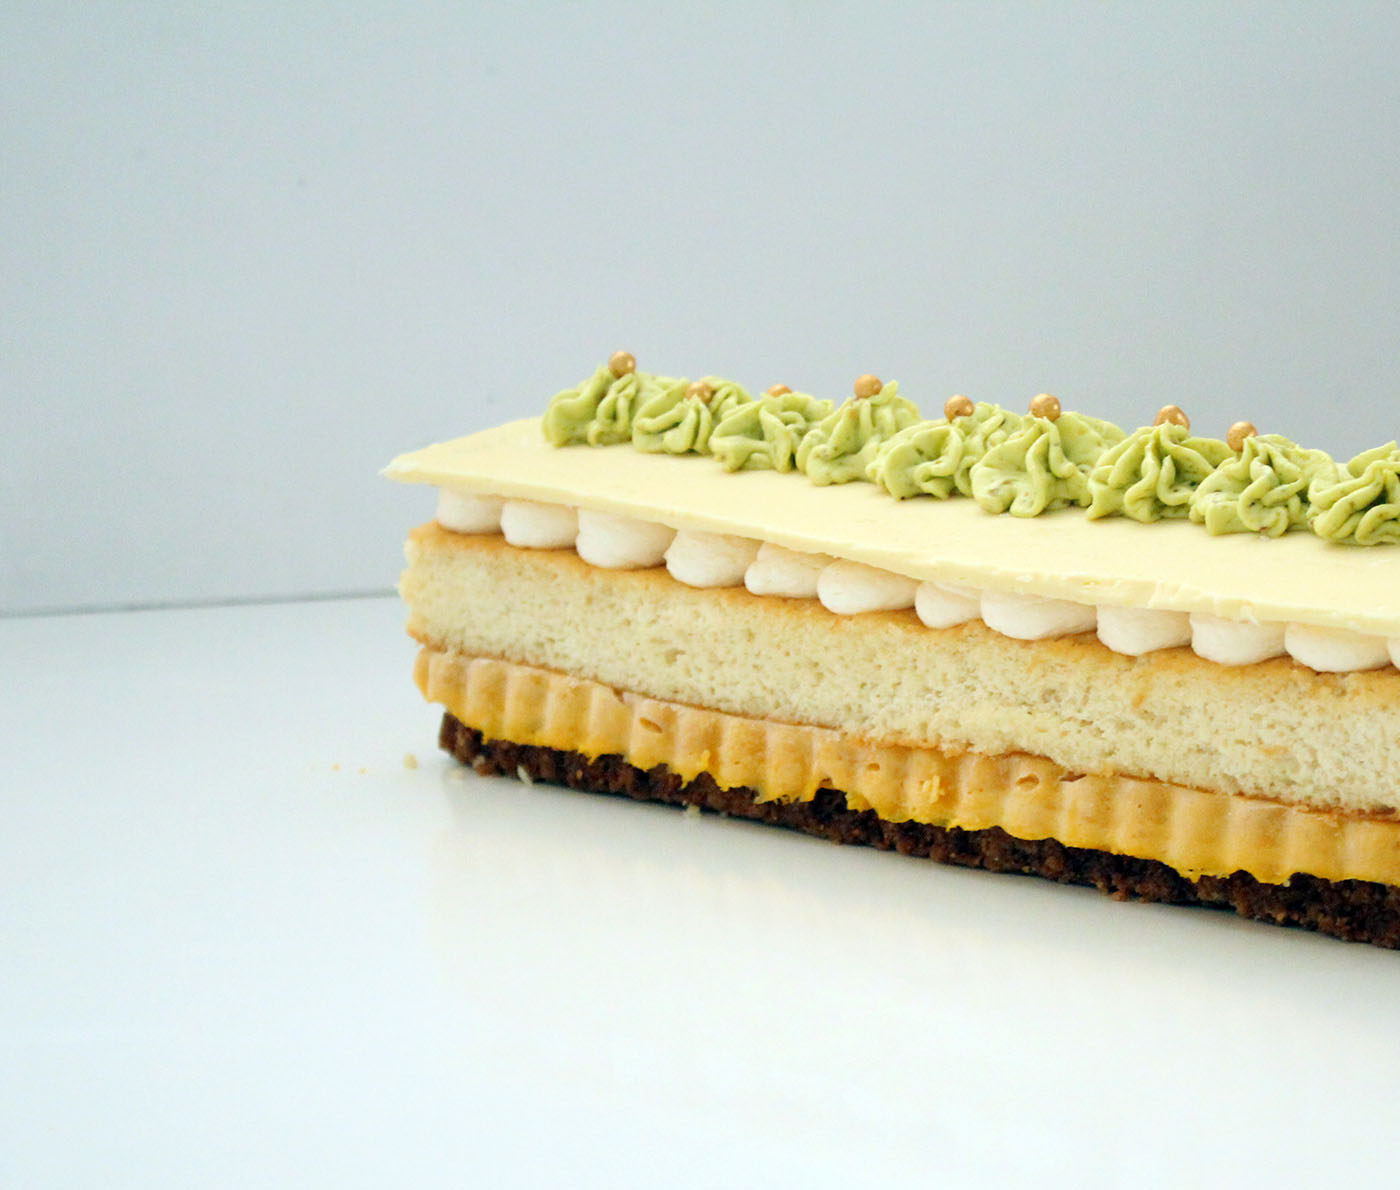 IMG 9245 - עוגת שכבות אקזותית